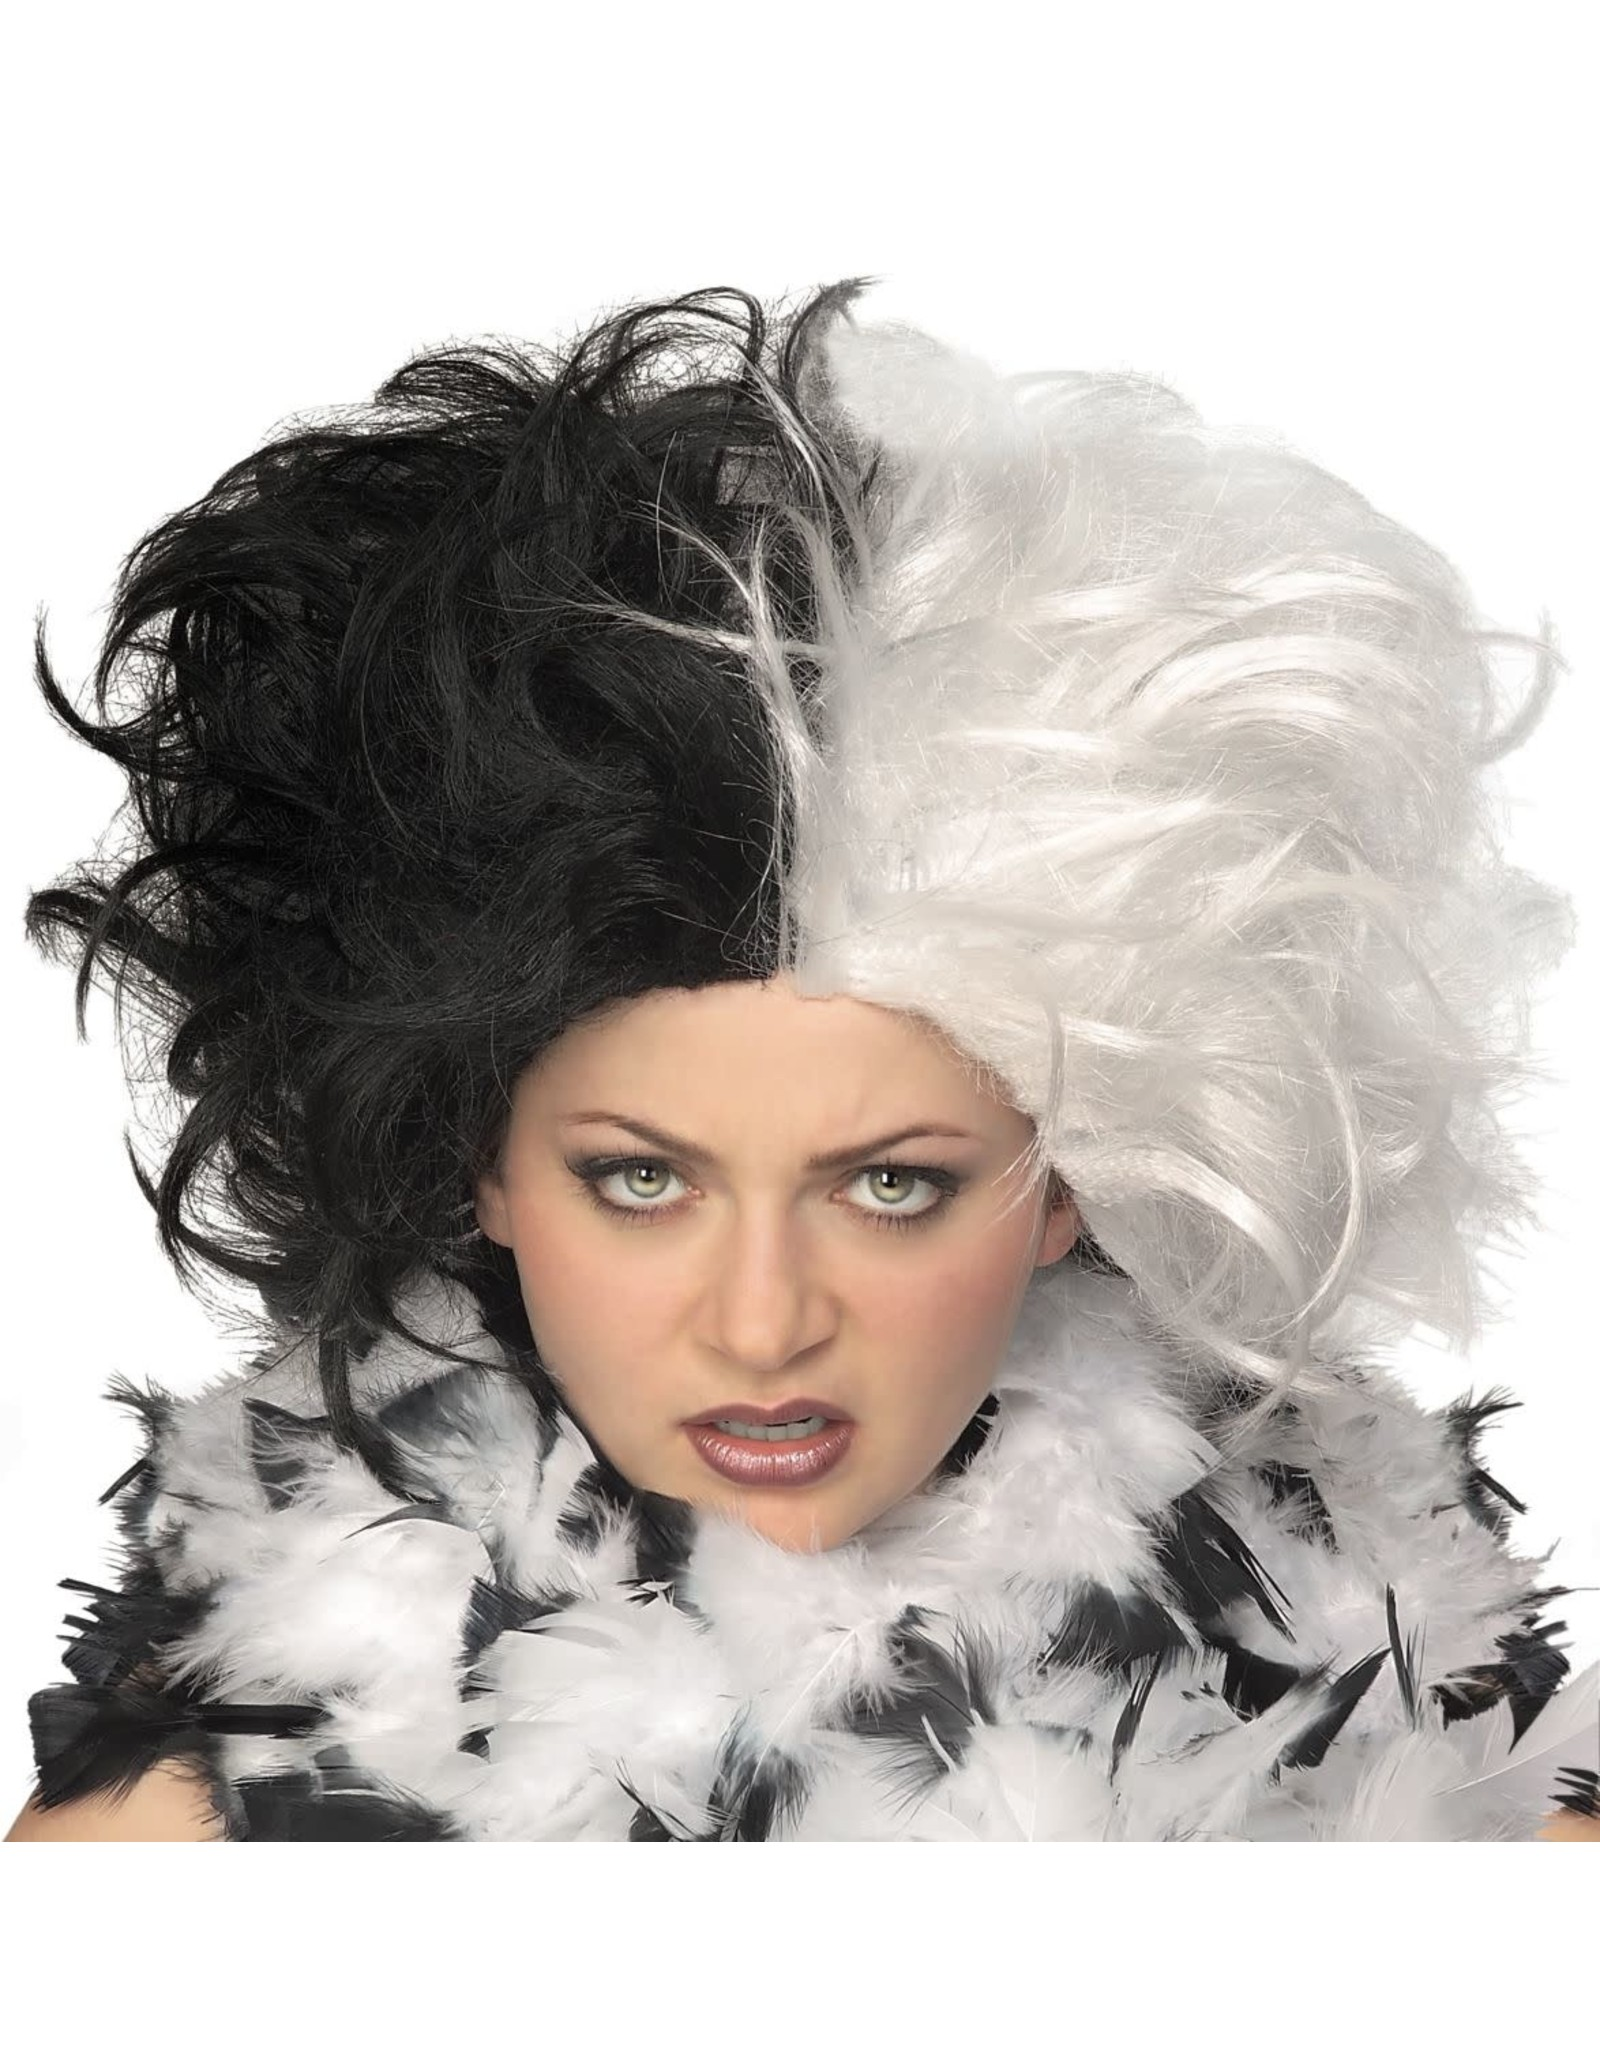 Rubies Costume Ms.Spot Wig